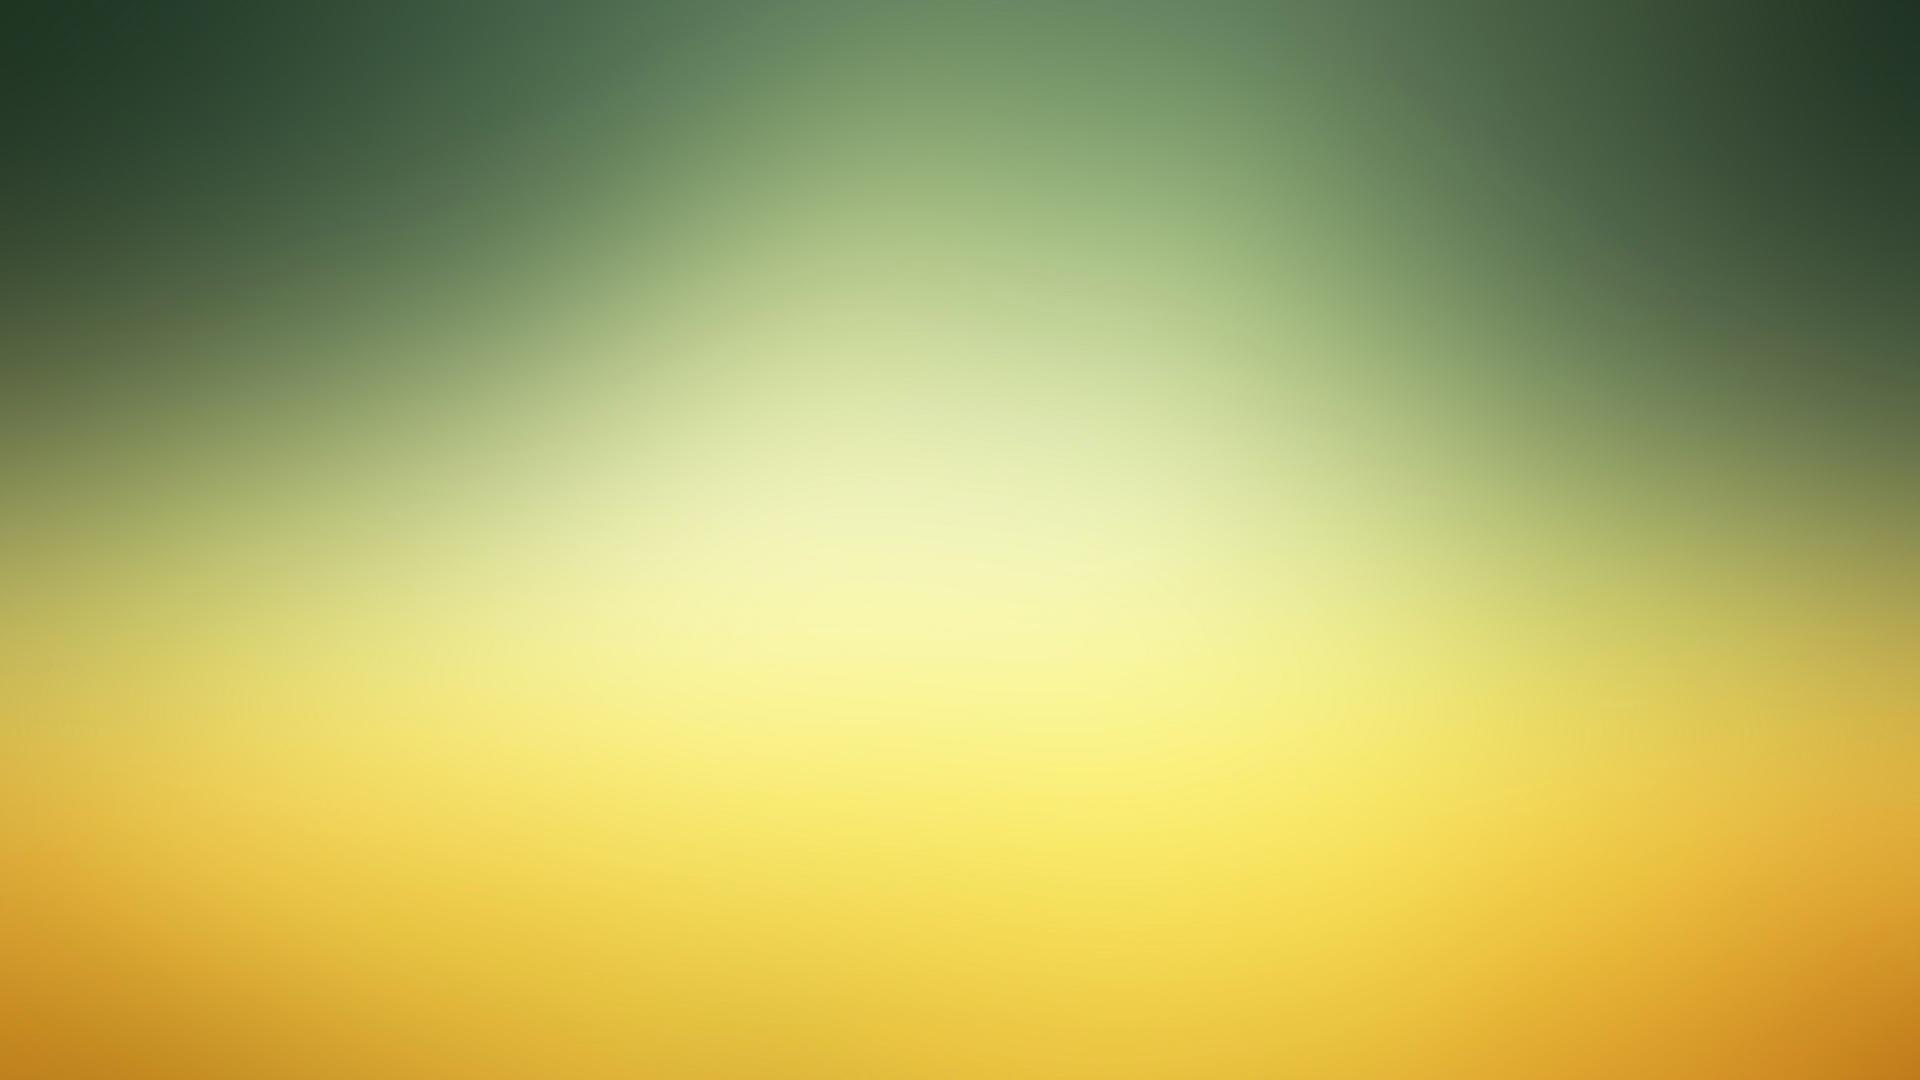 color gradient wallpaper hd 73 images